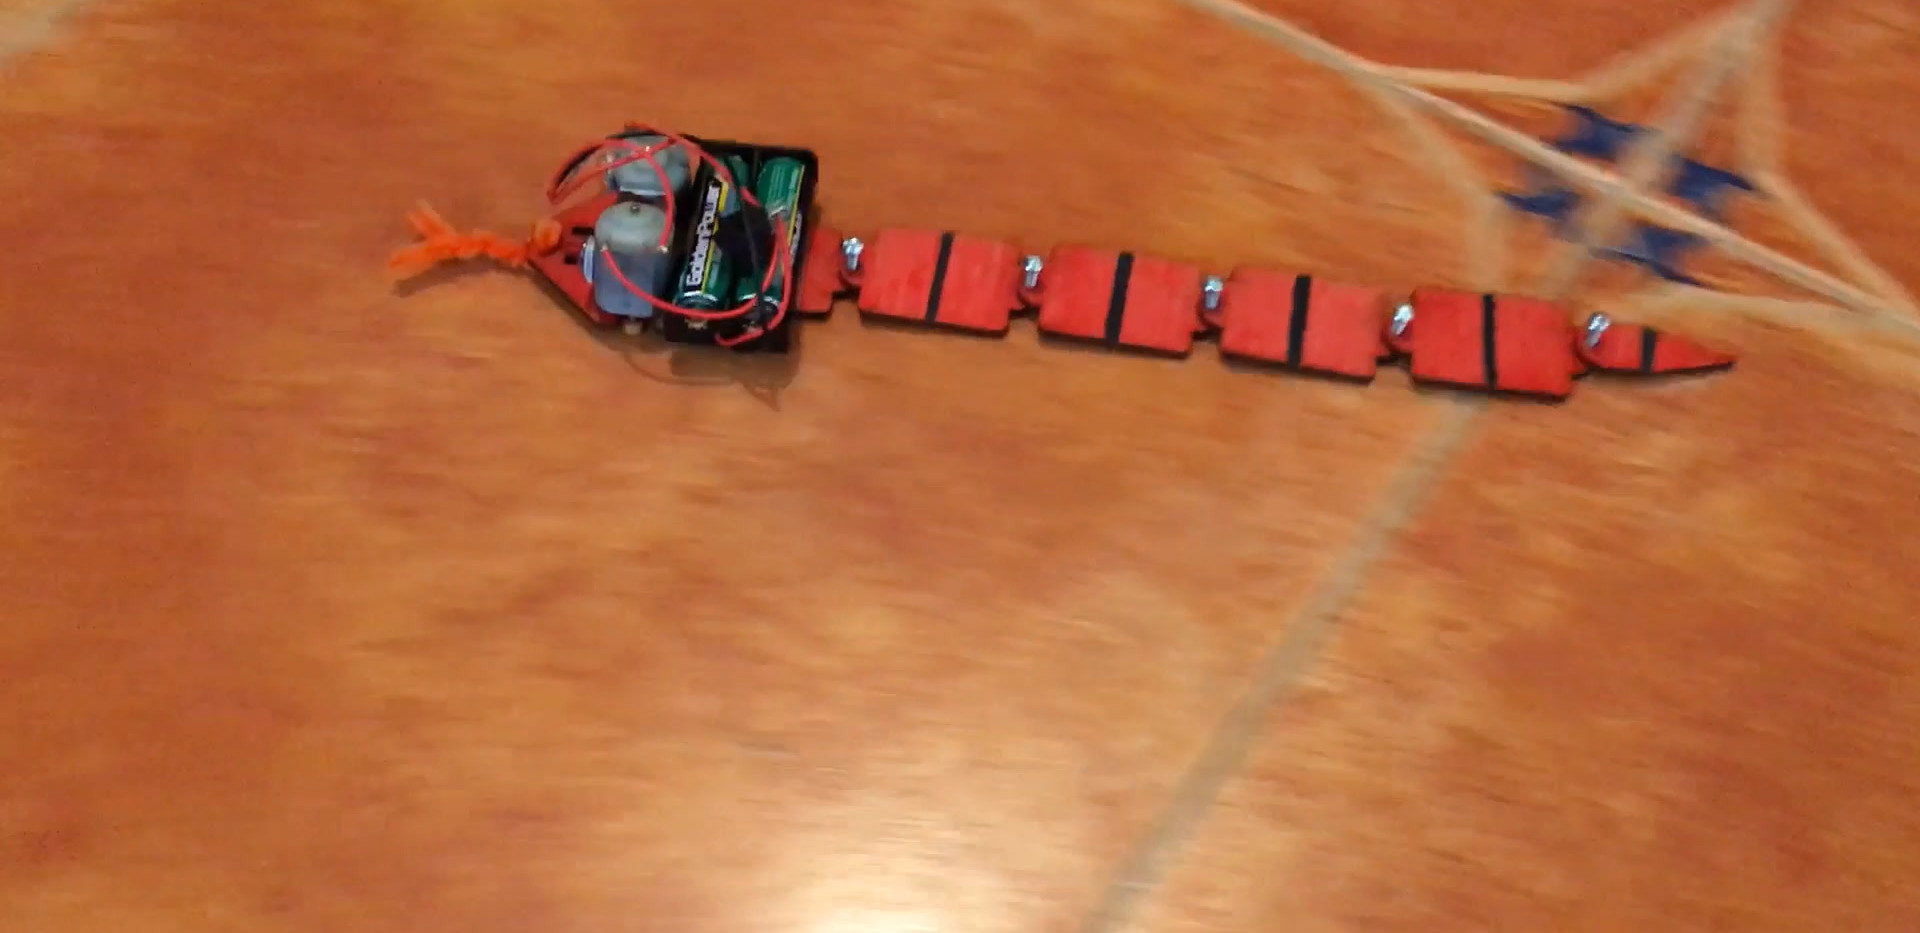 Snake-bot 6seg.mp4